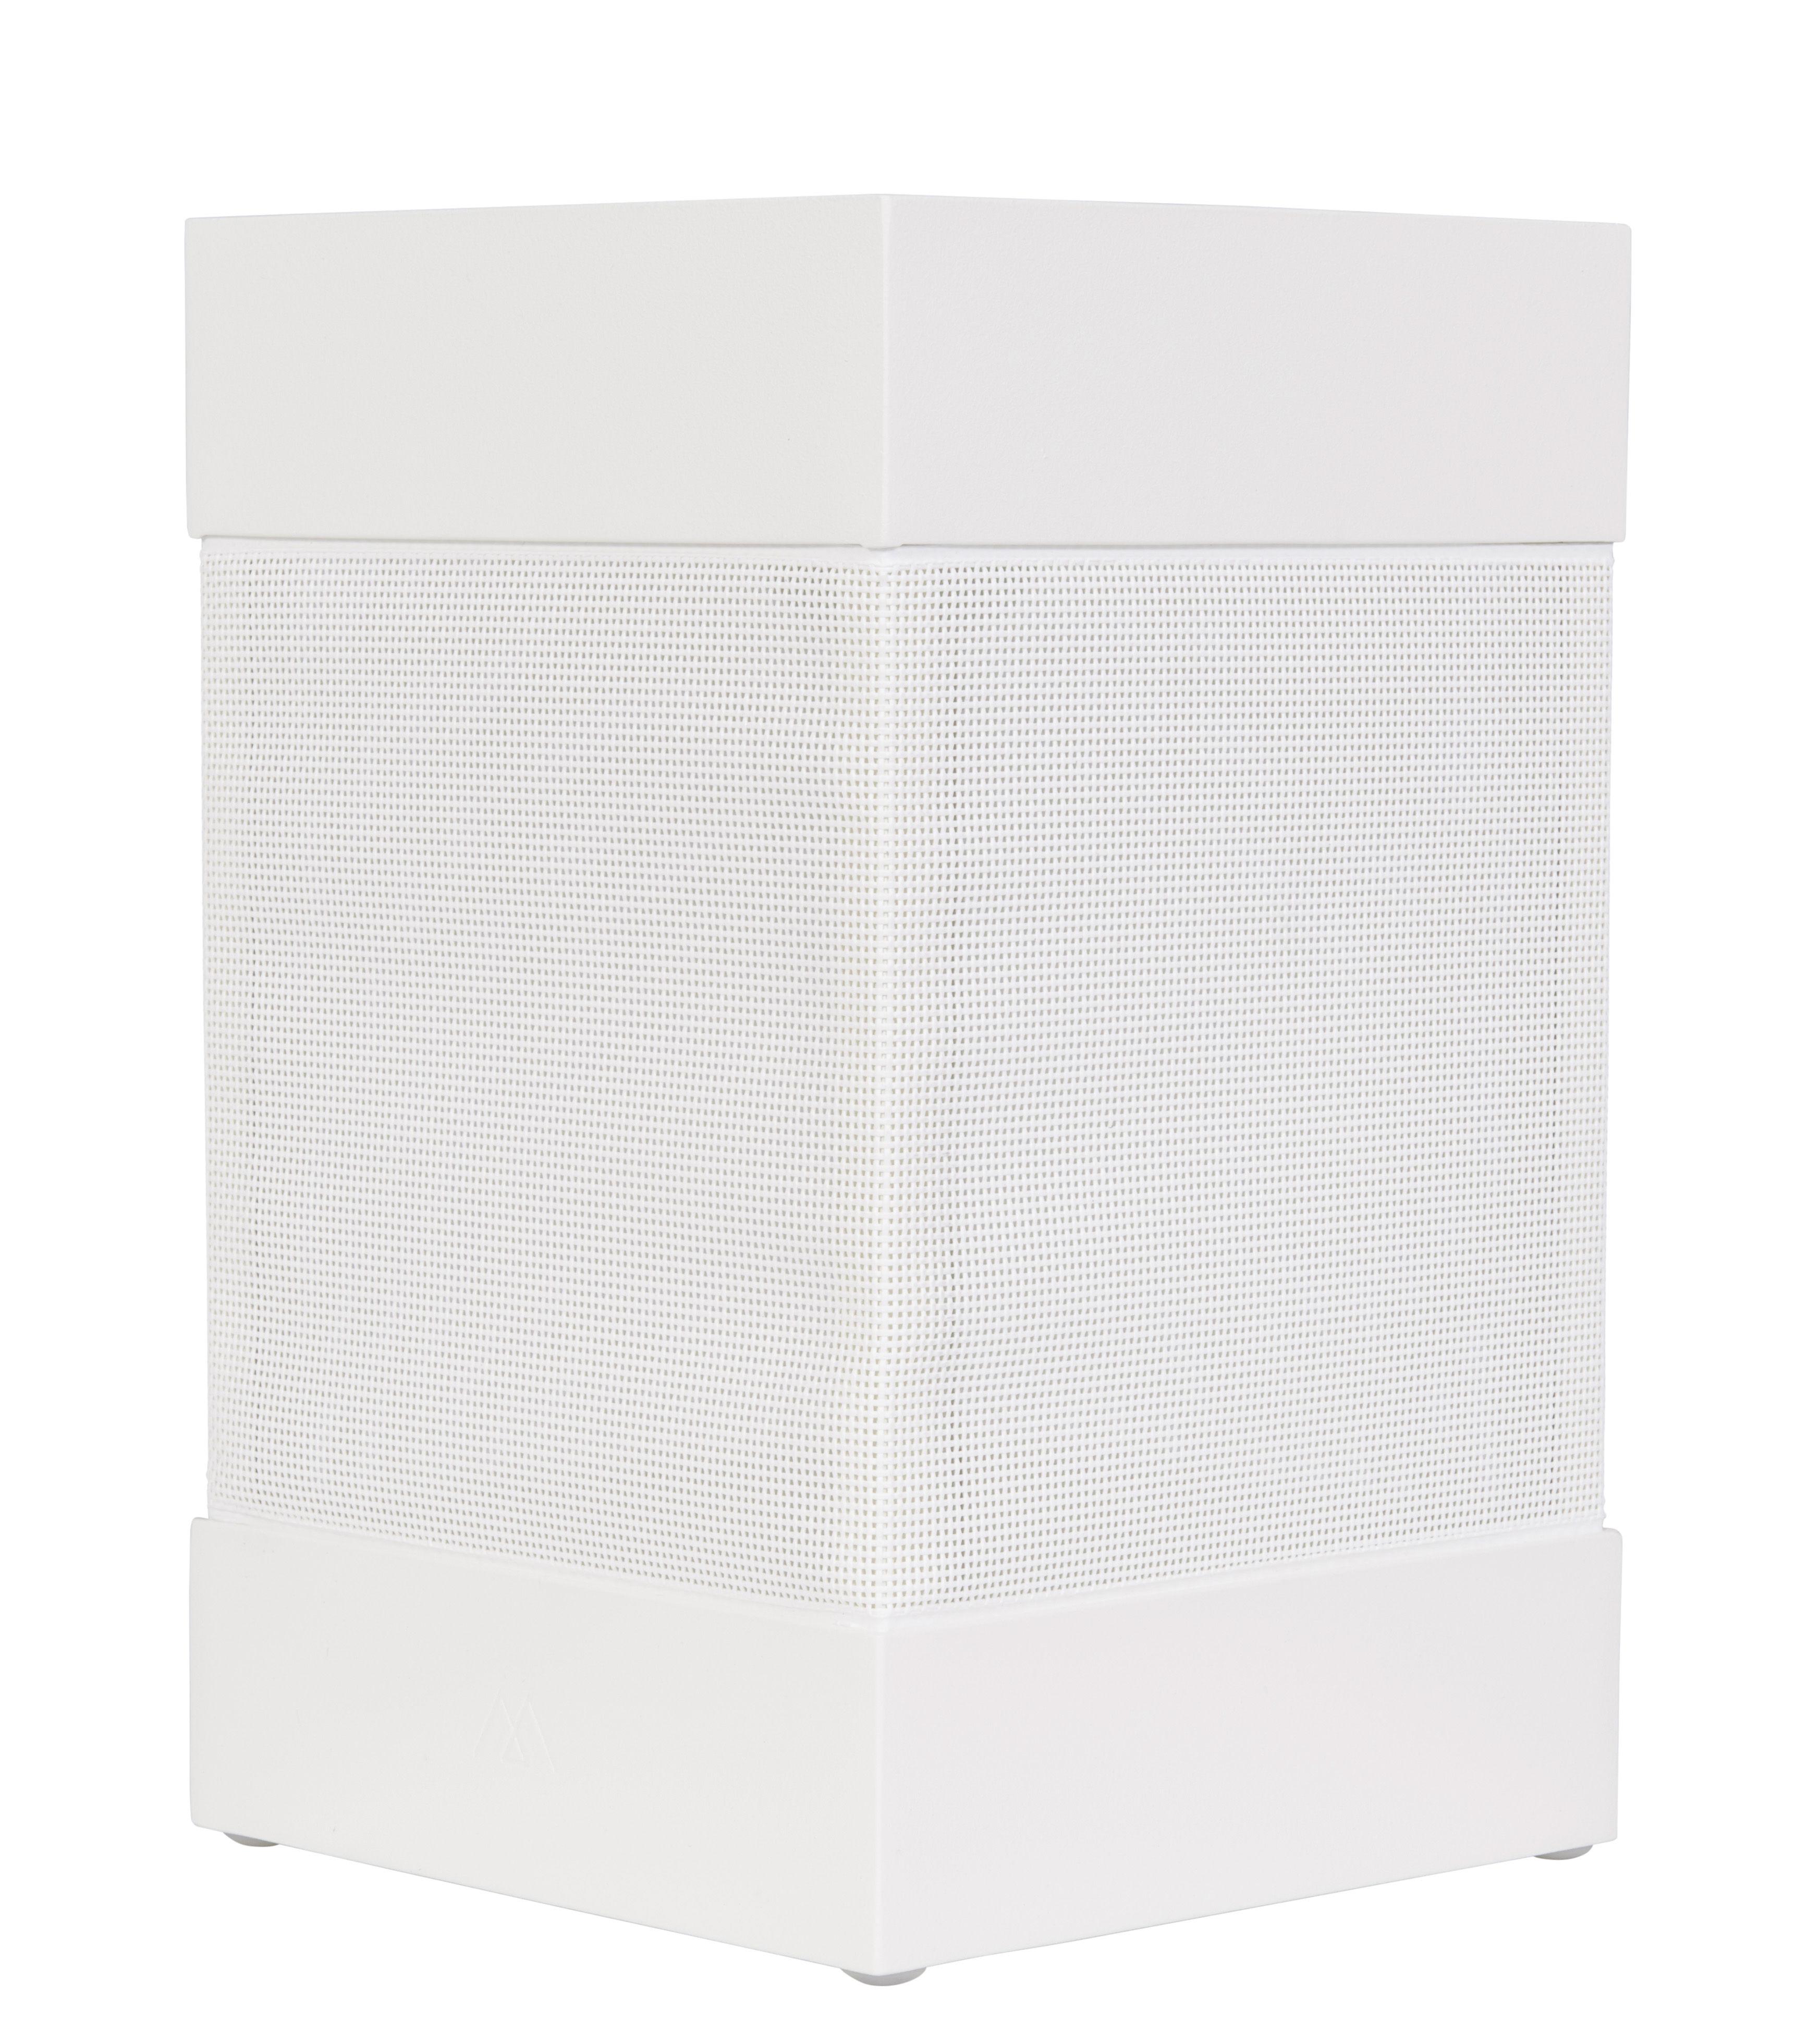 Lighting - Table Lamps - La Lampe Pose 03 Solar lamp by Maiori - White - Aluminium, Technical fabric